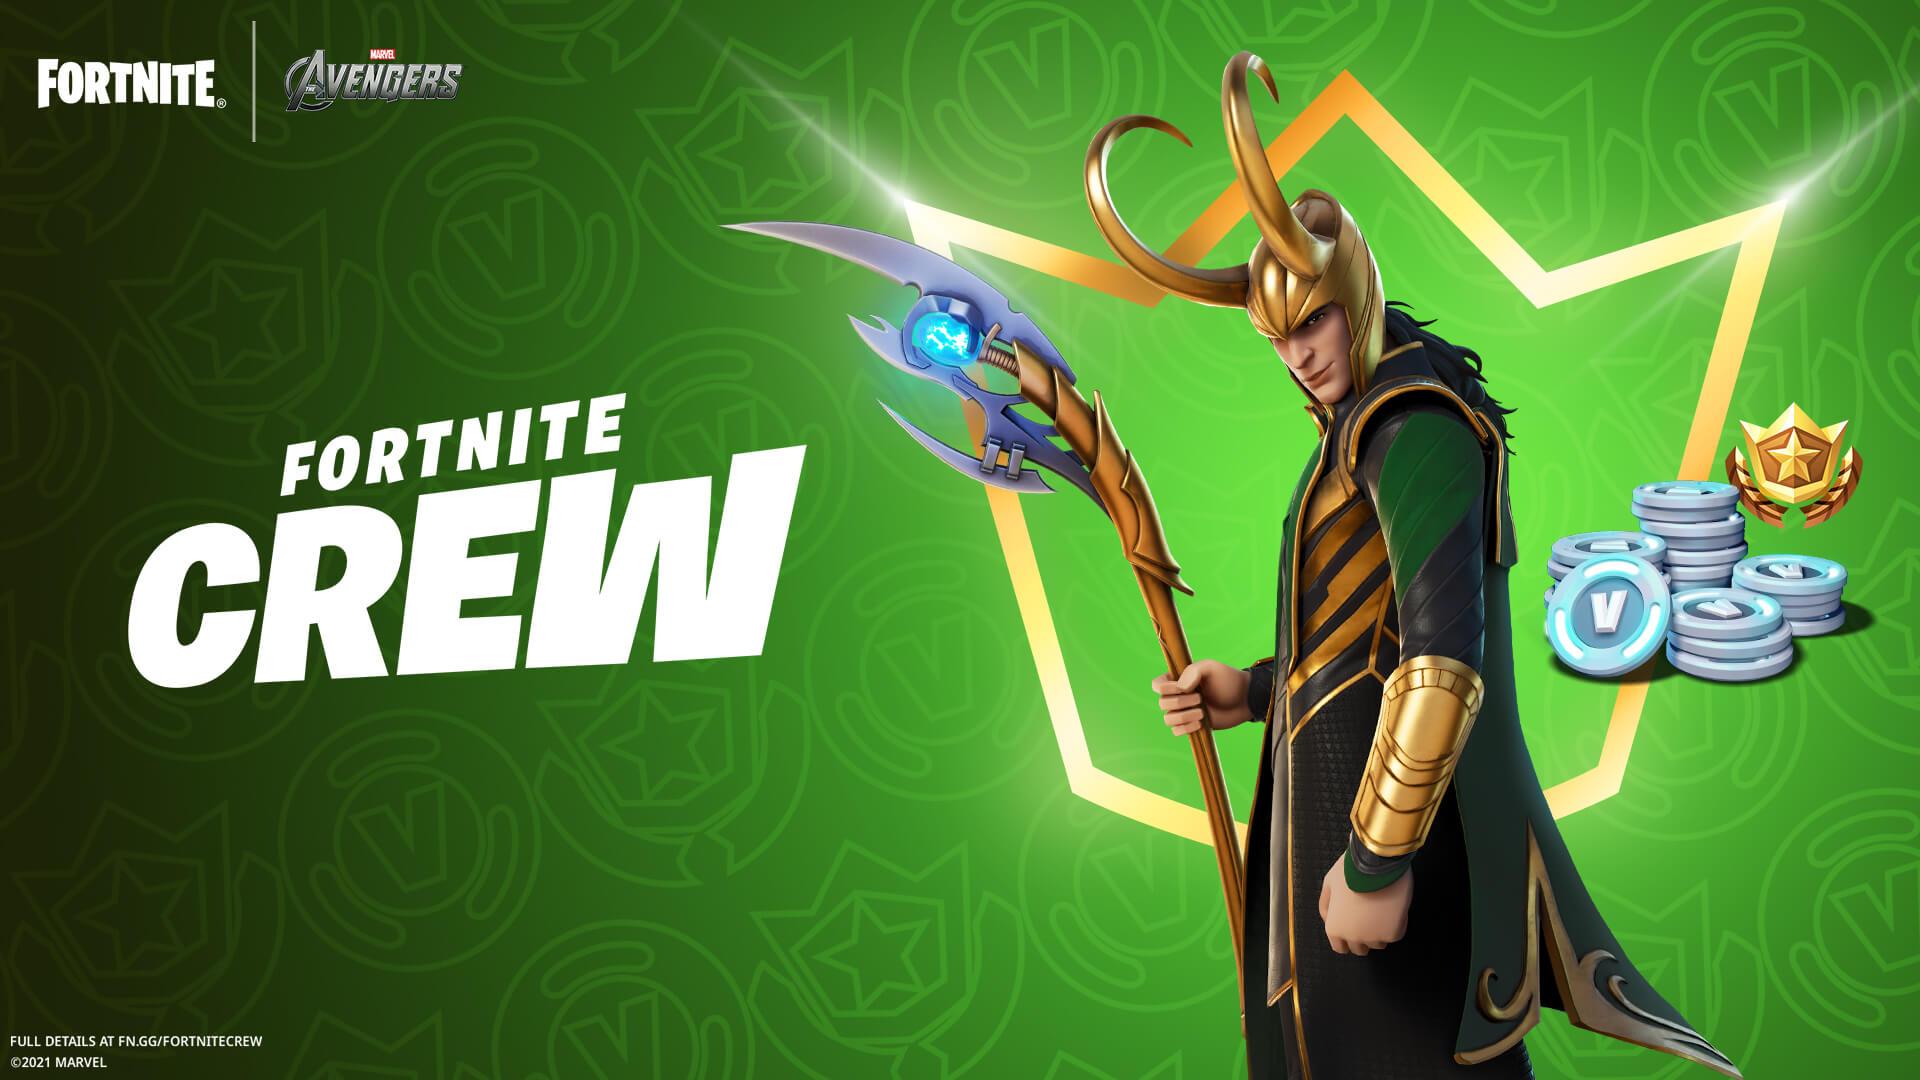 Glow Skin Fortnite Full No Men Like Him Loki Laufeyson Enters The Fortnite Crew For July